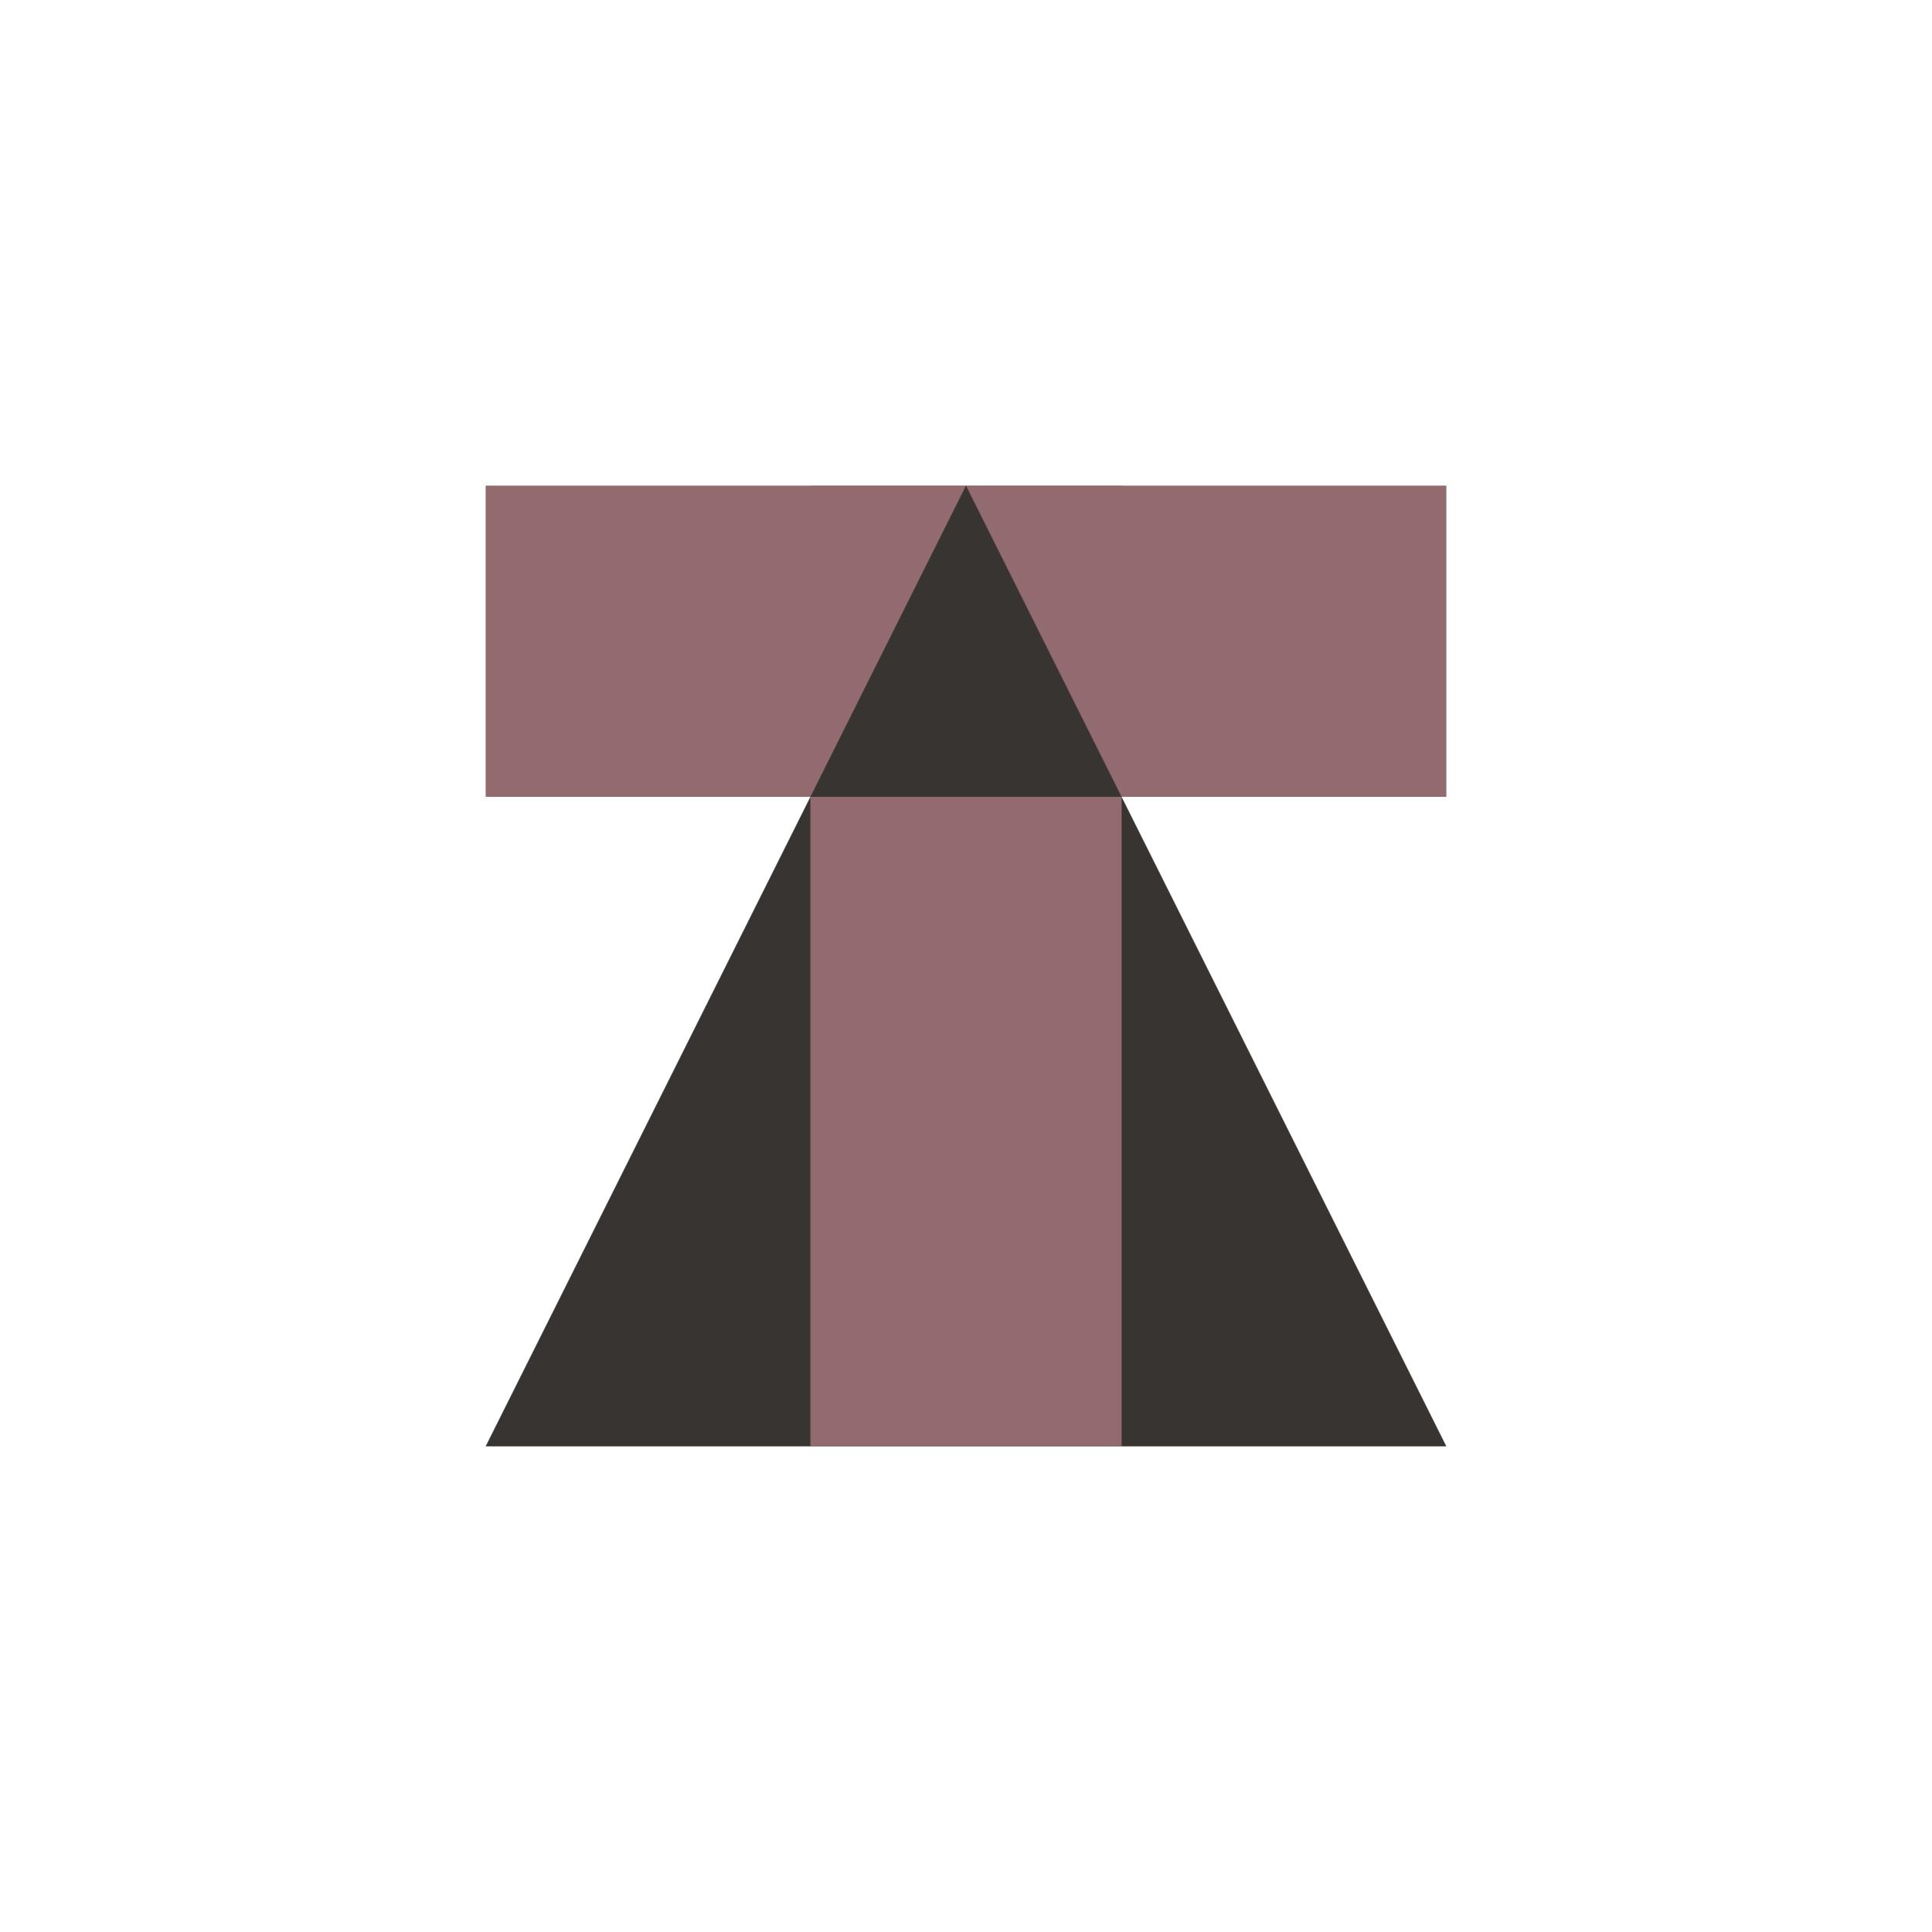 Логотип и фирменный стиль фото f_7845efcca9bc96ac.jpg